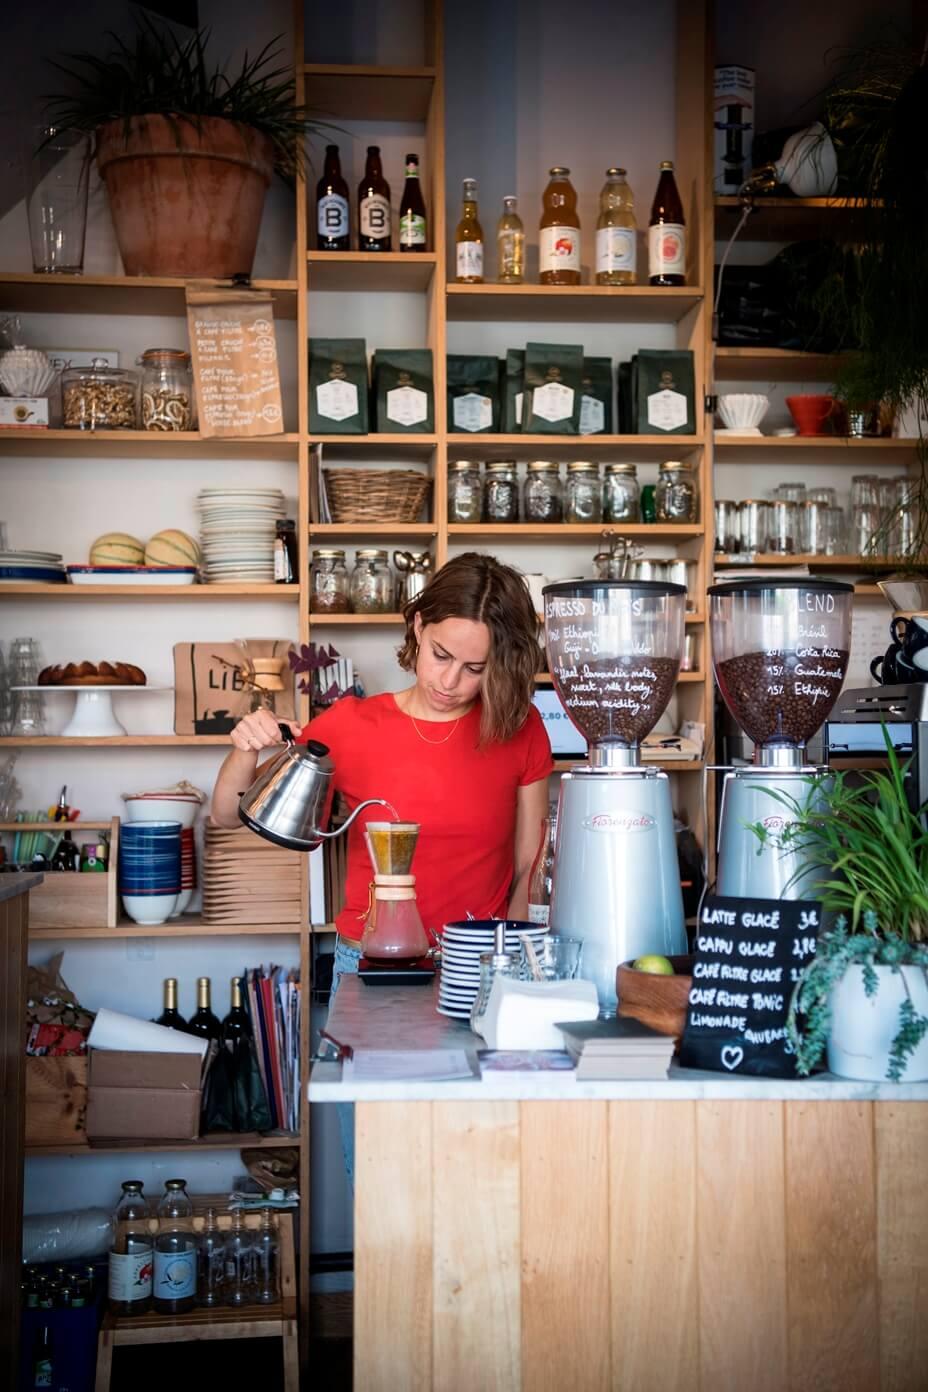 Luik koffiebar